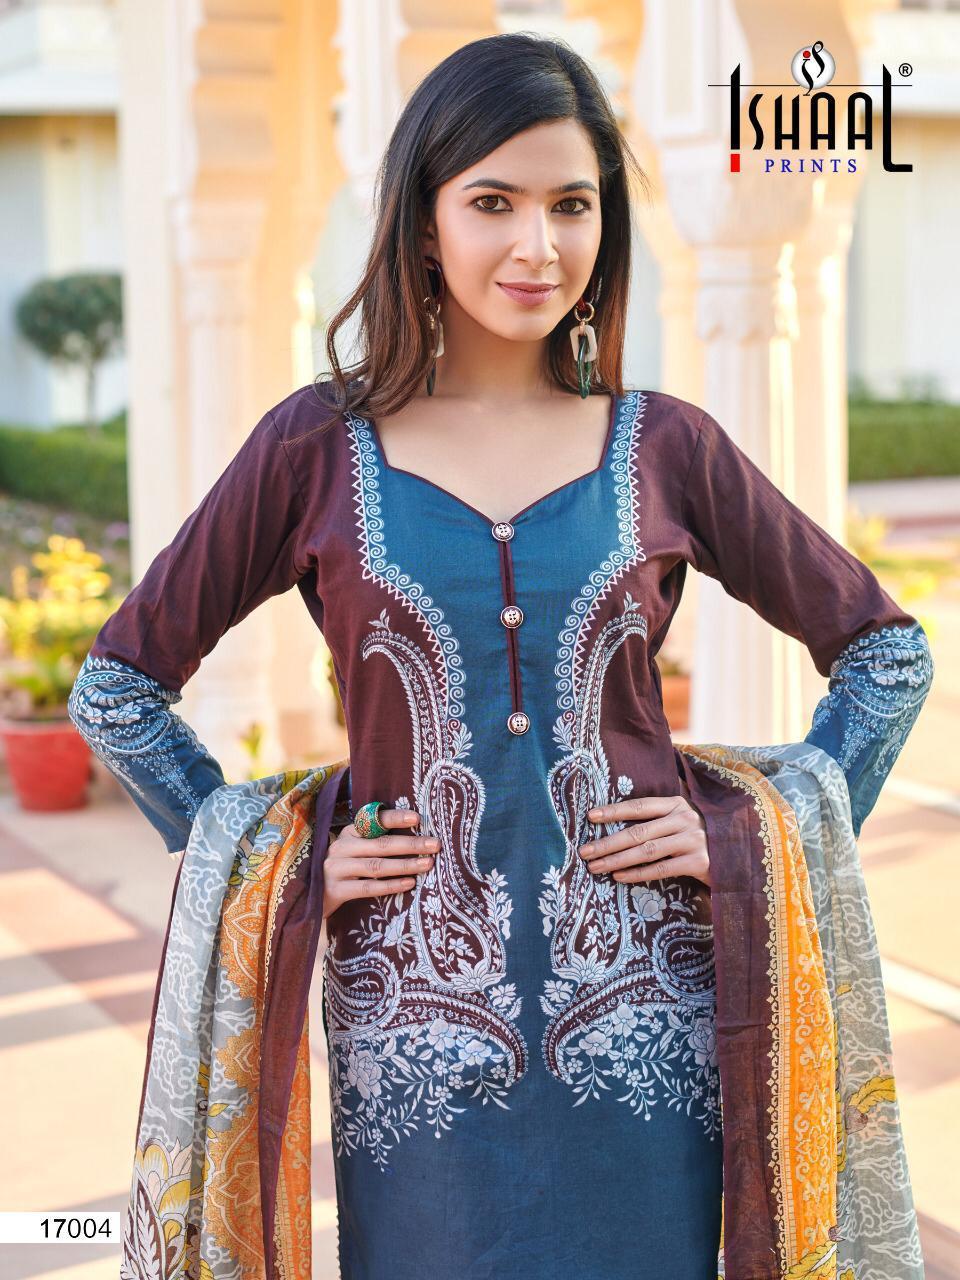 Ishaal Gulmohar Vol 17 Salwar Suit Wholesale Catalog 10 Pcs 5 - Ishaal Gulmohar Vol 17 Salwar Suit Wholesale Catalog 10 Pcs